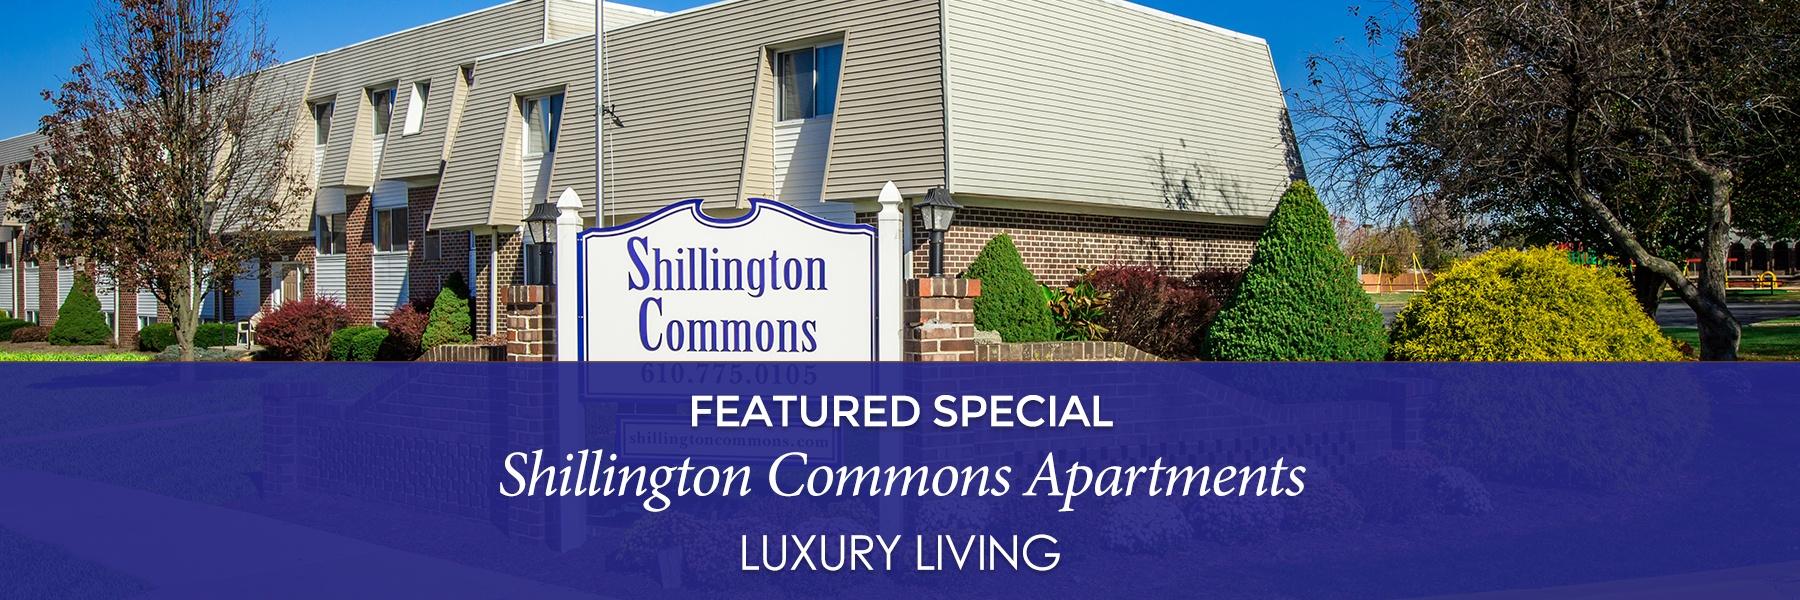 Shillington Commons Apartments For Rent in Shillington, PA Specials